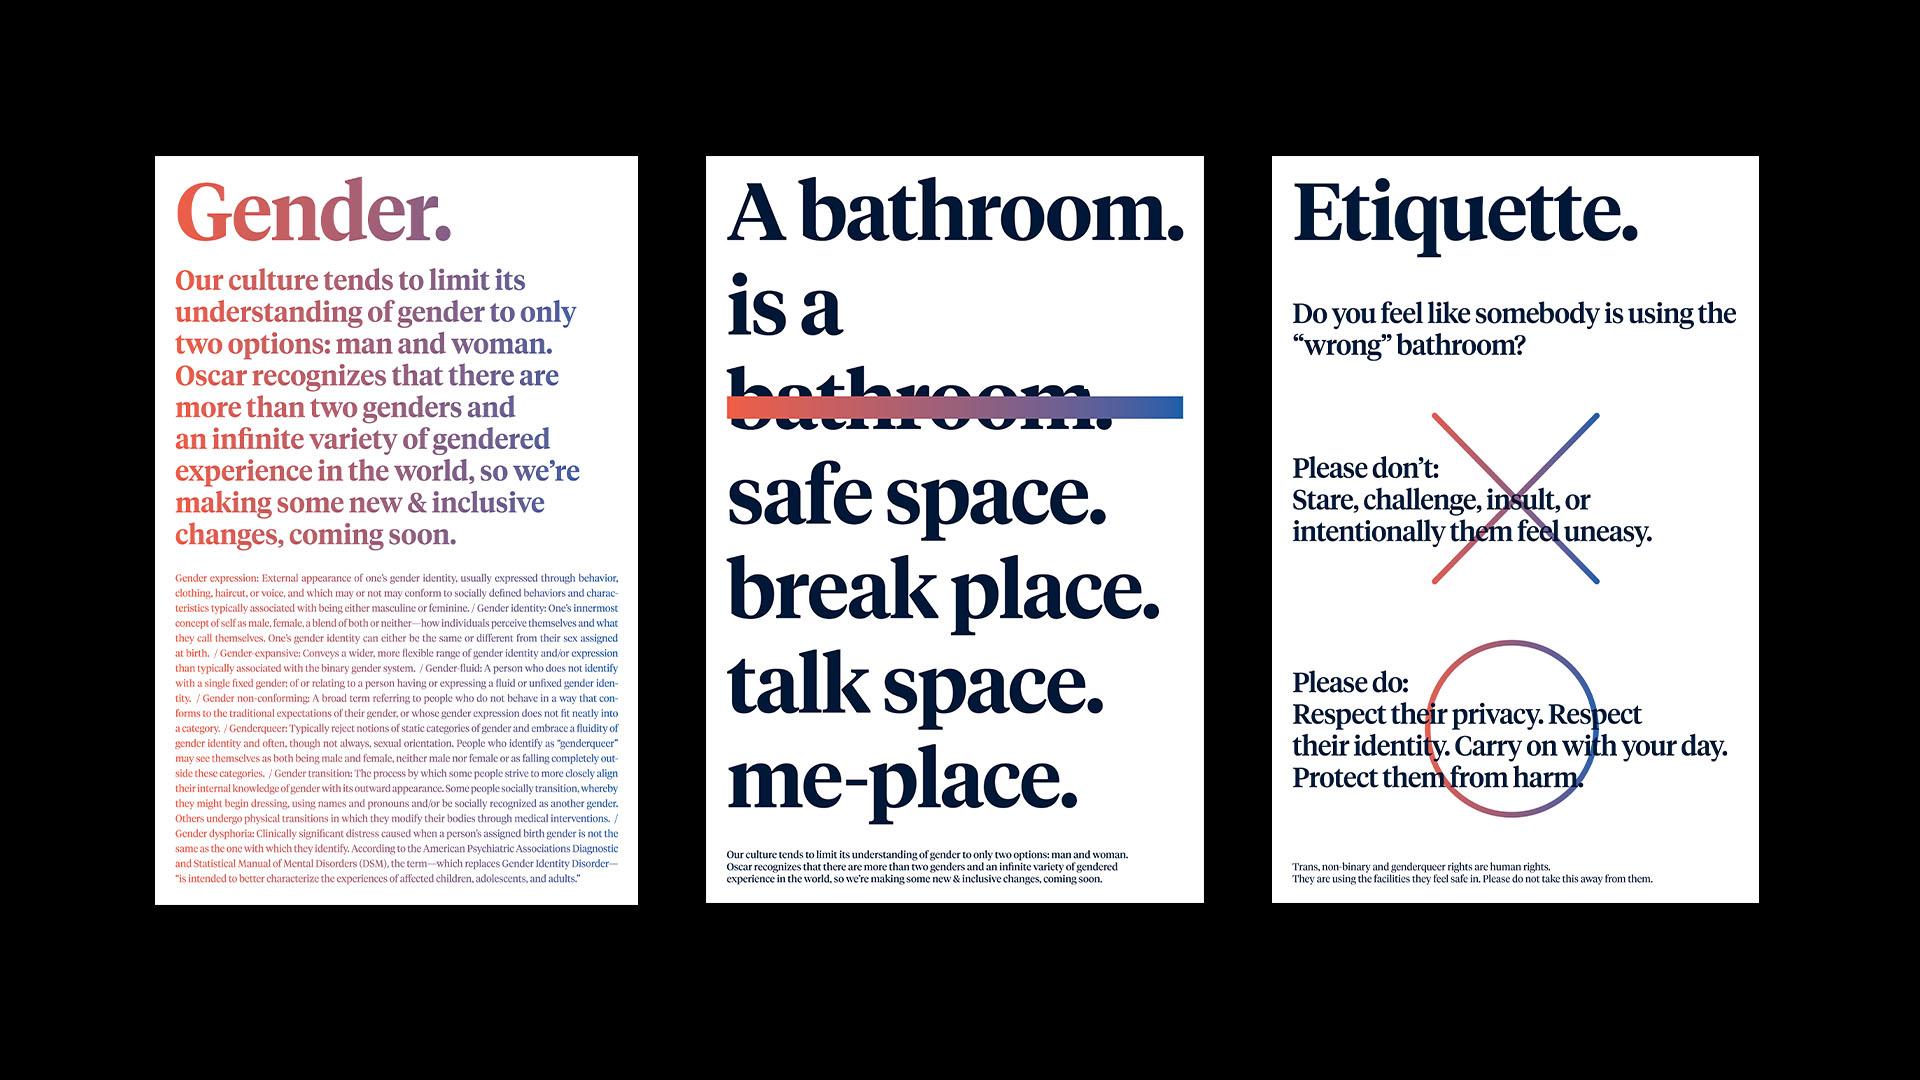 Genderneutral_restrooms.jpg